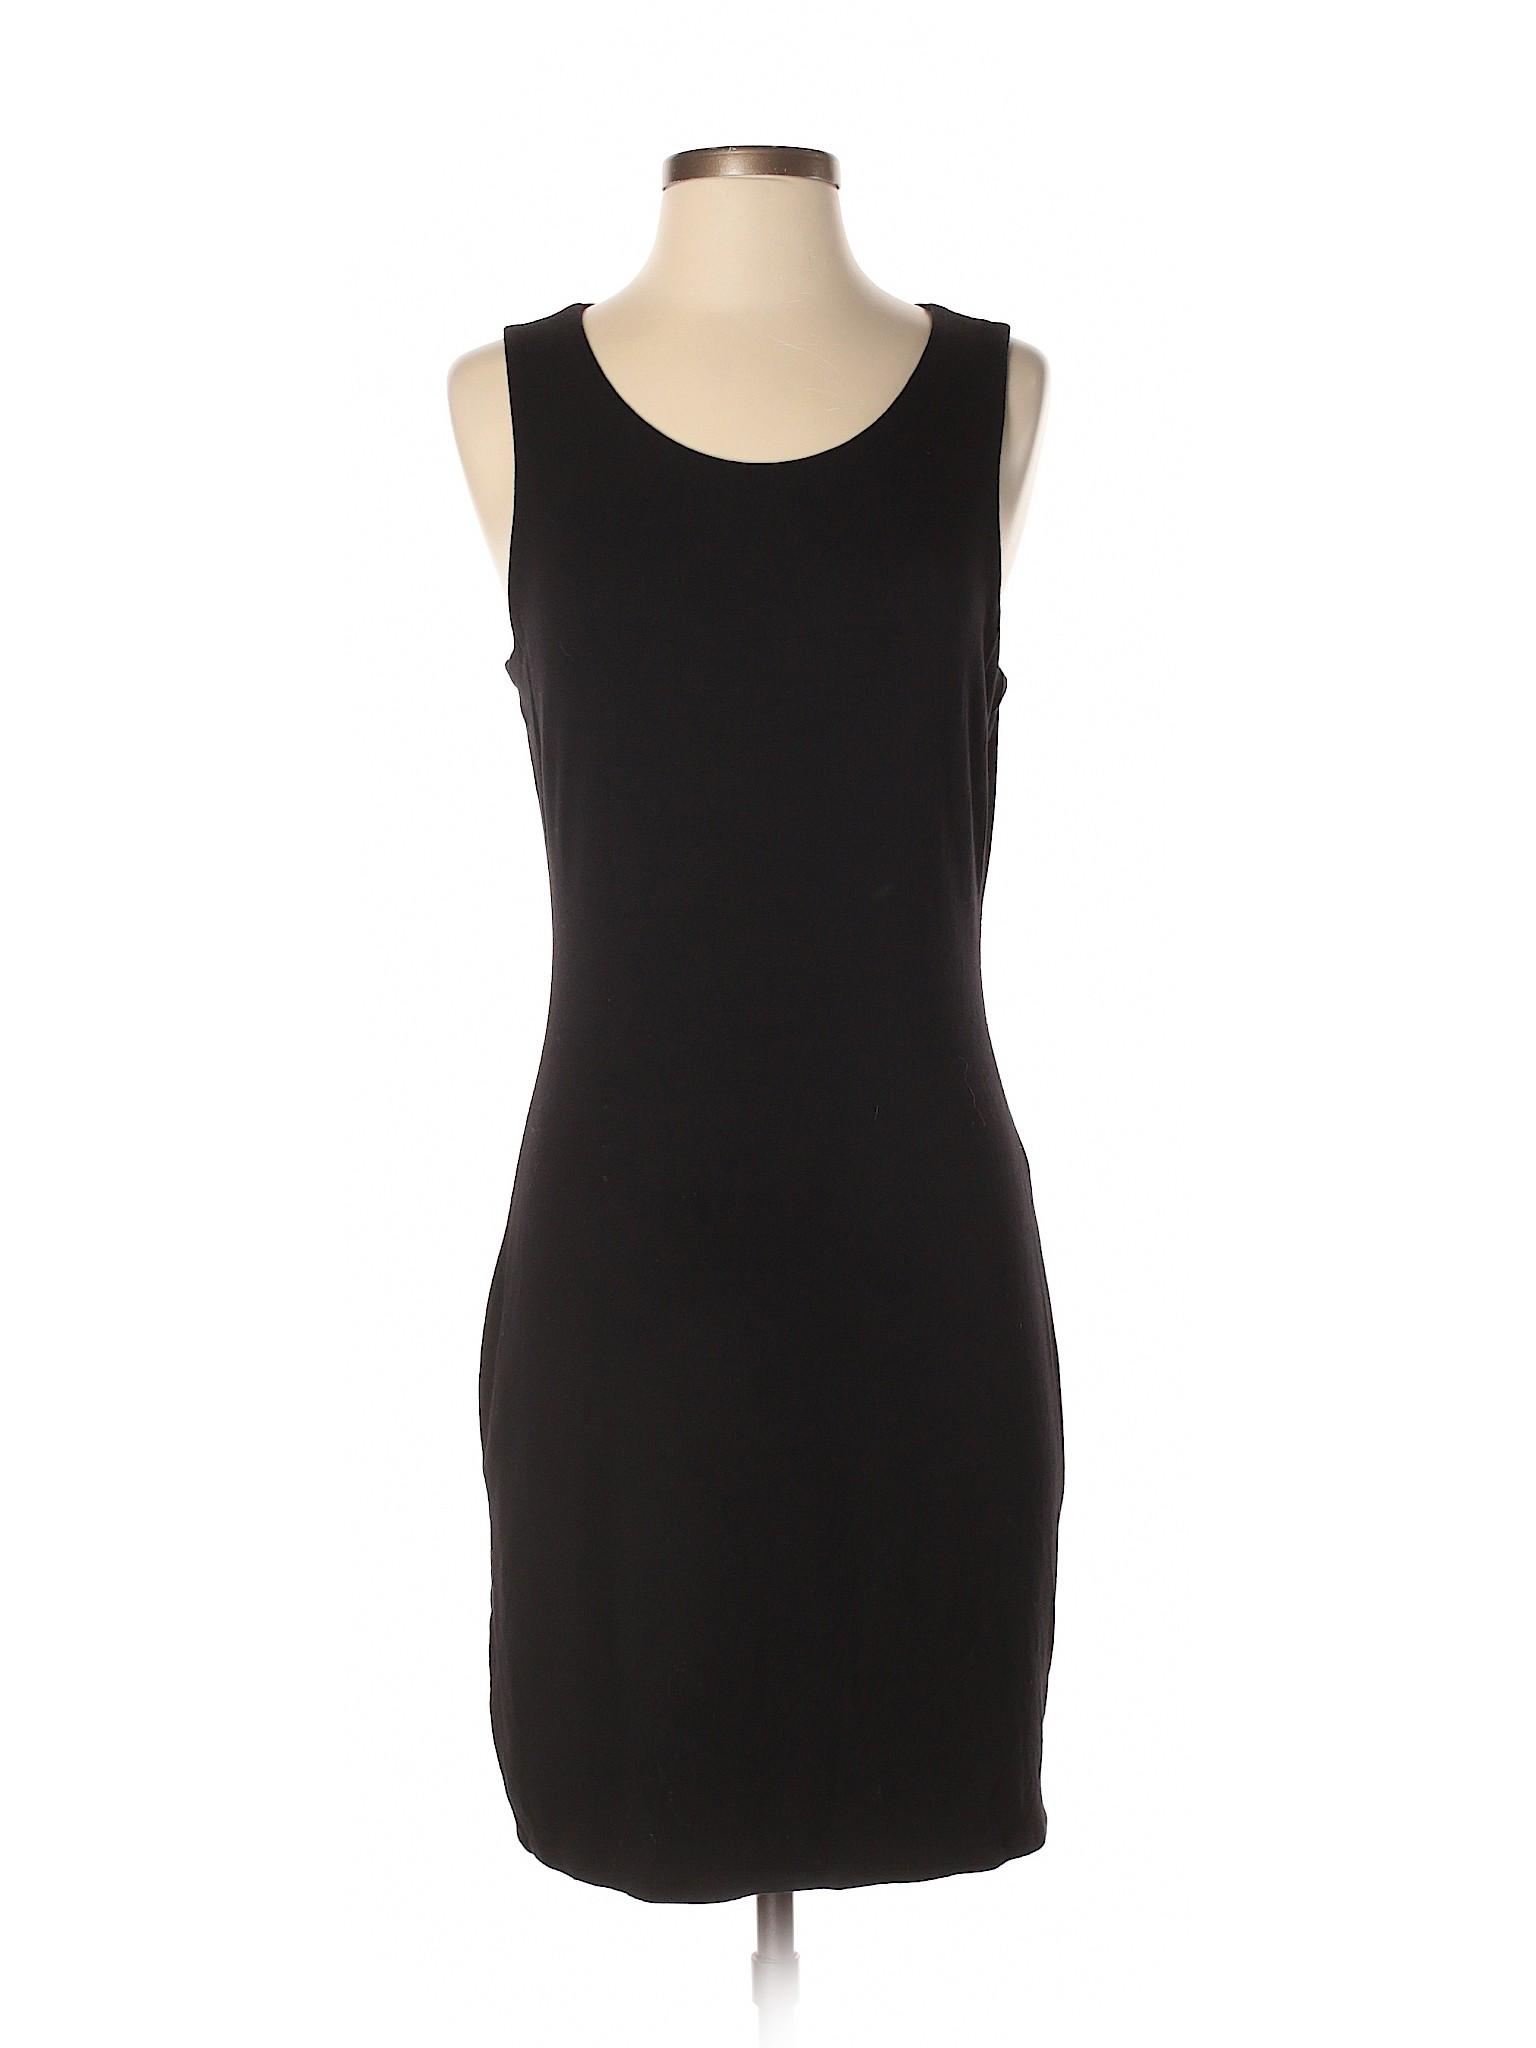 Guess Selling Casual Dress Dress Dress Guess Casual Guess Casual Selling Selling YpfUOnW